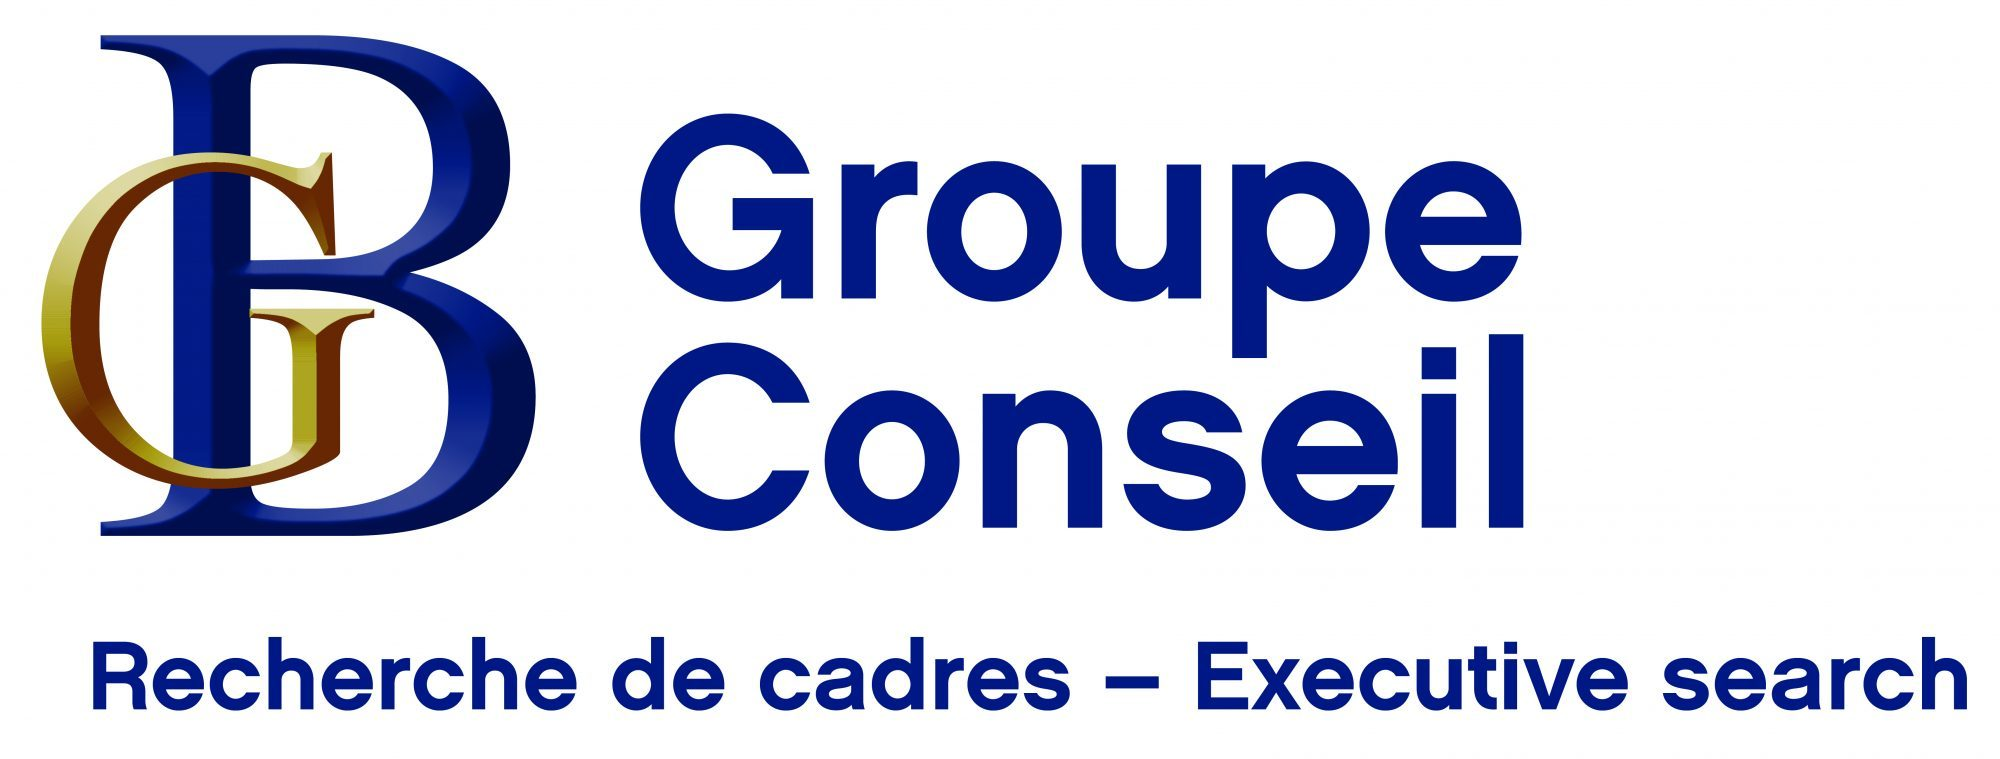 GB_logo-HR-0415.jpg